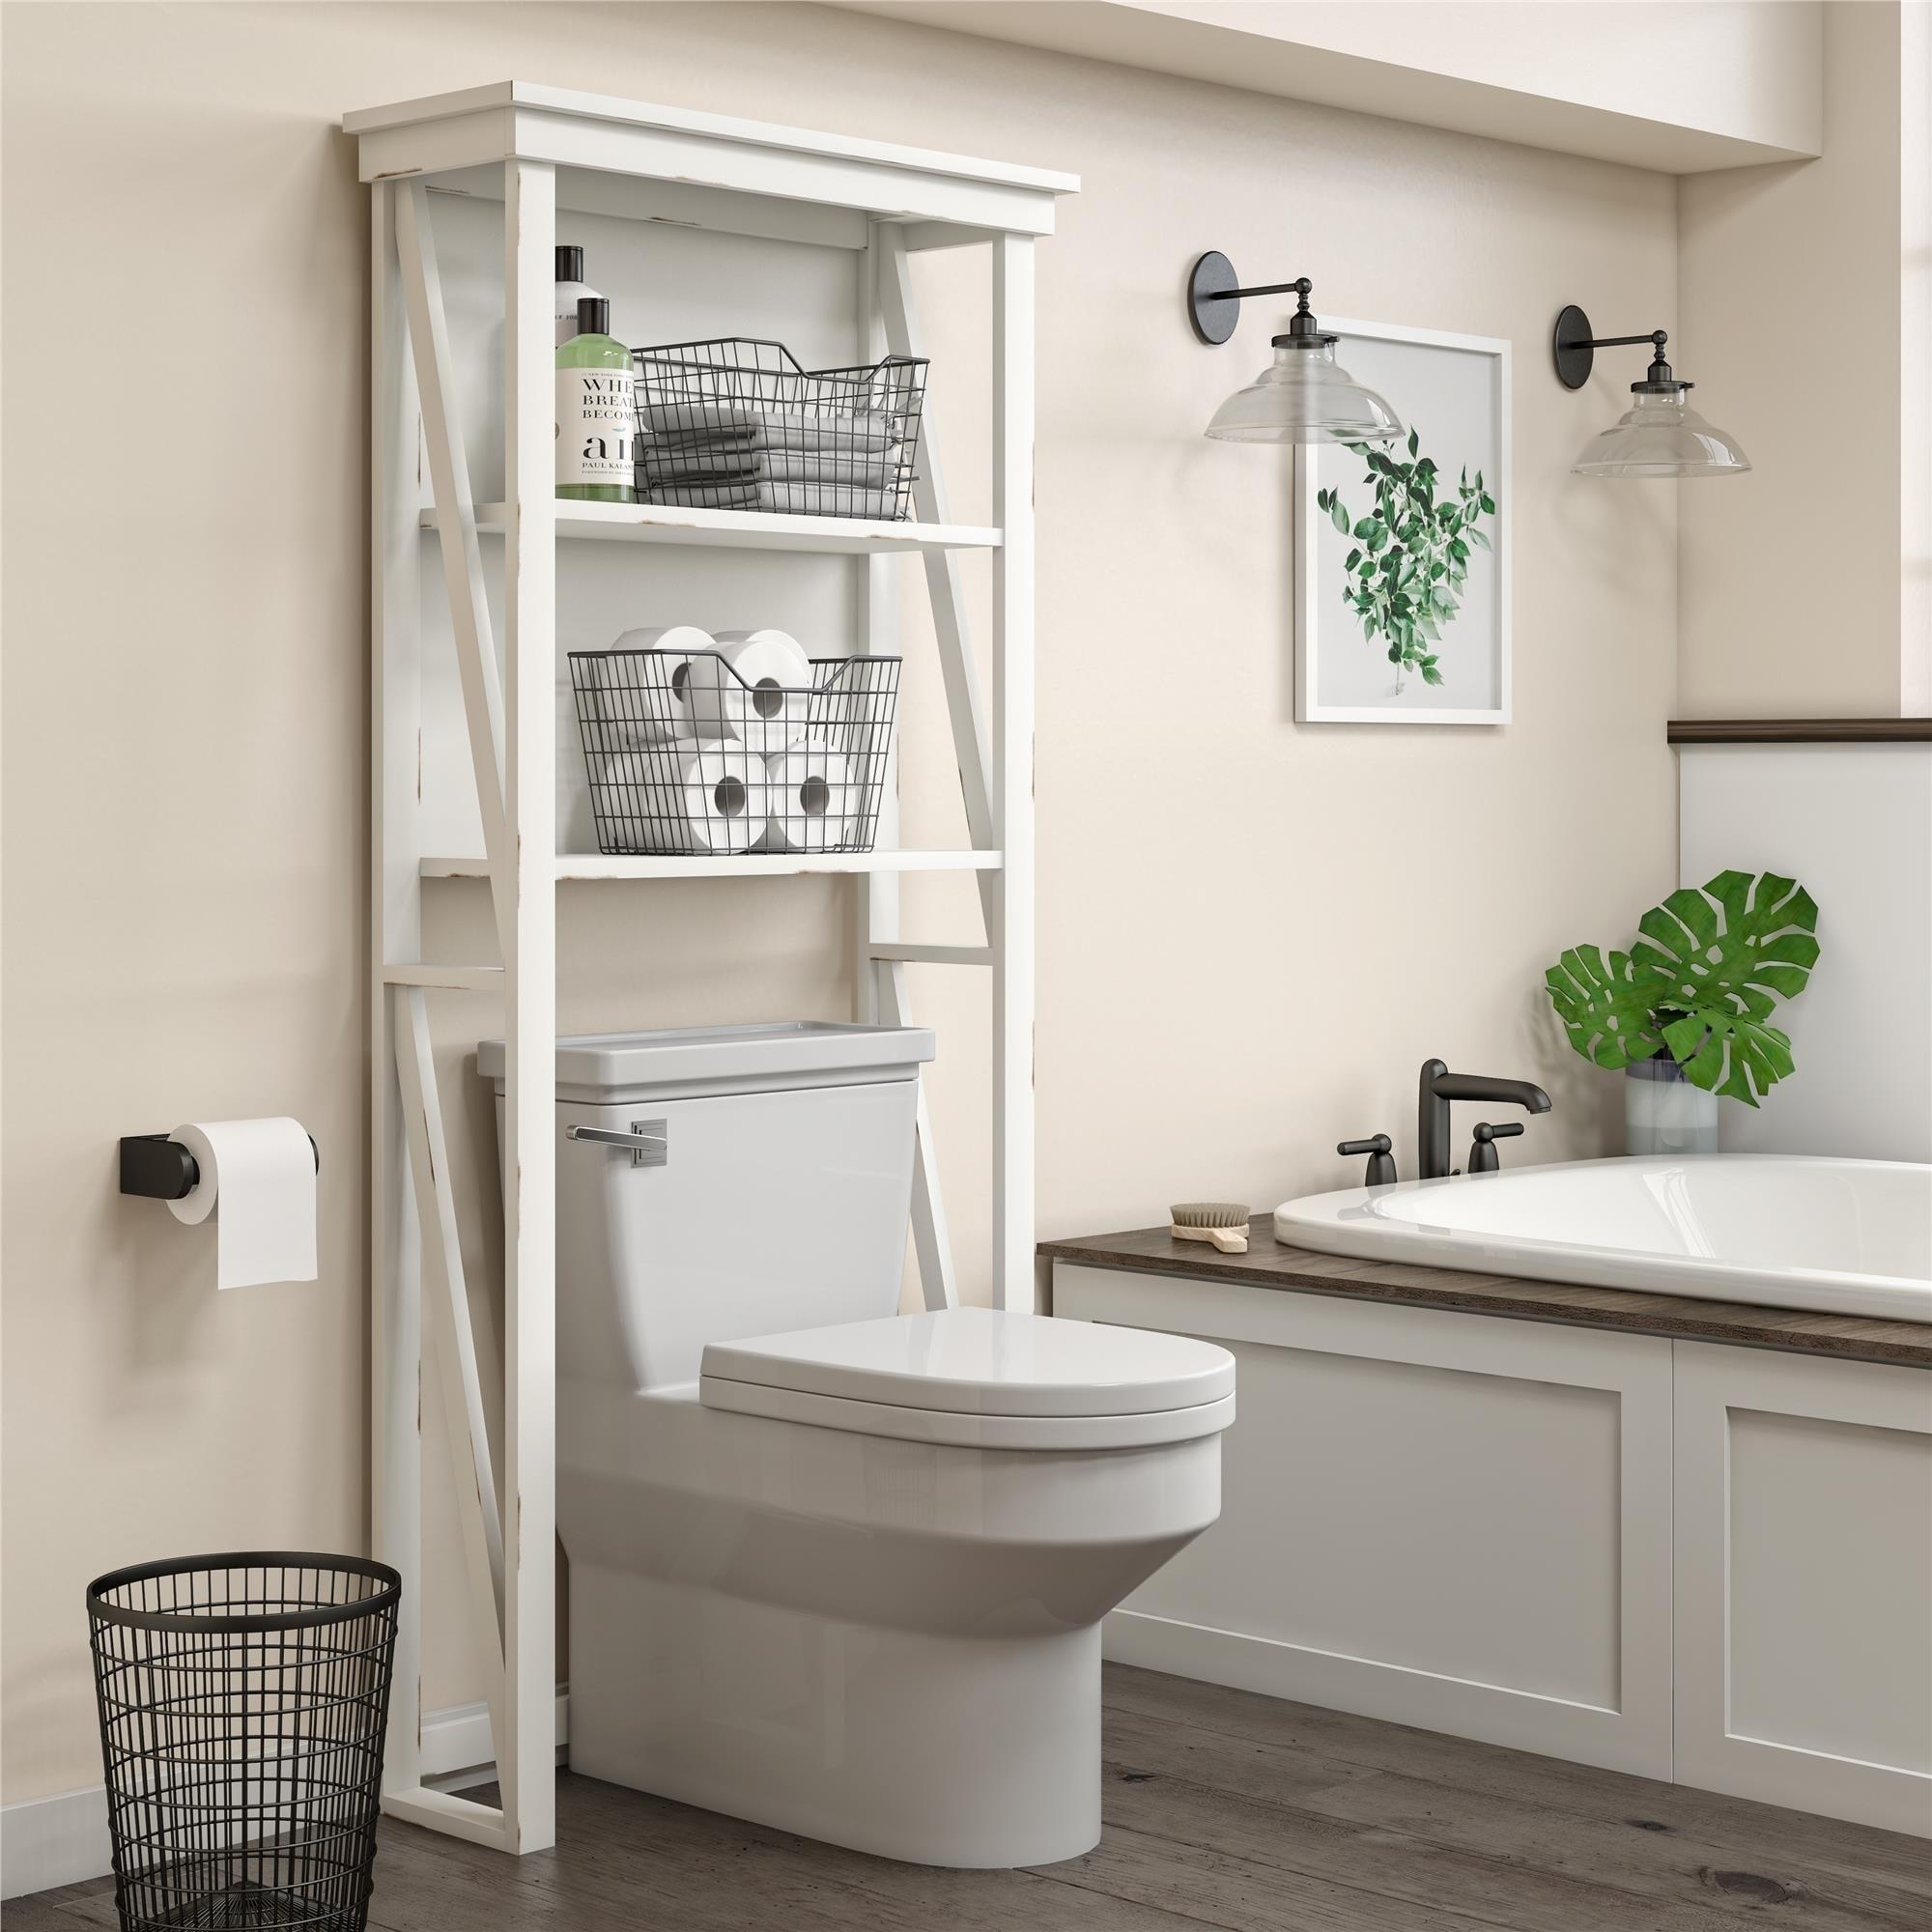 Avenue Greene Livingston White Over The Toilet Storage Cabinet Overstock 28527735